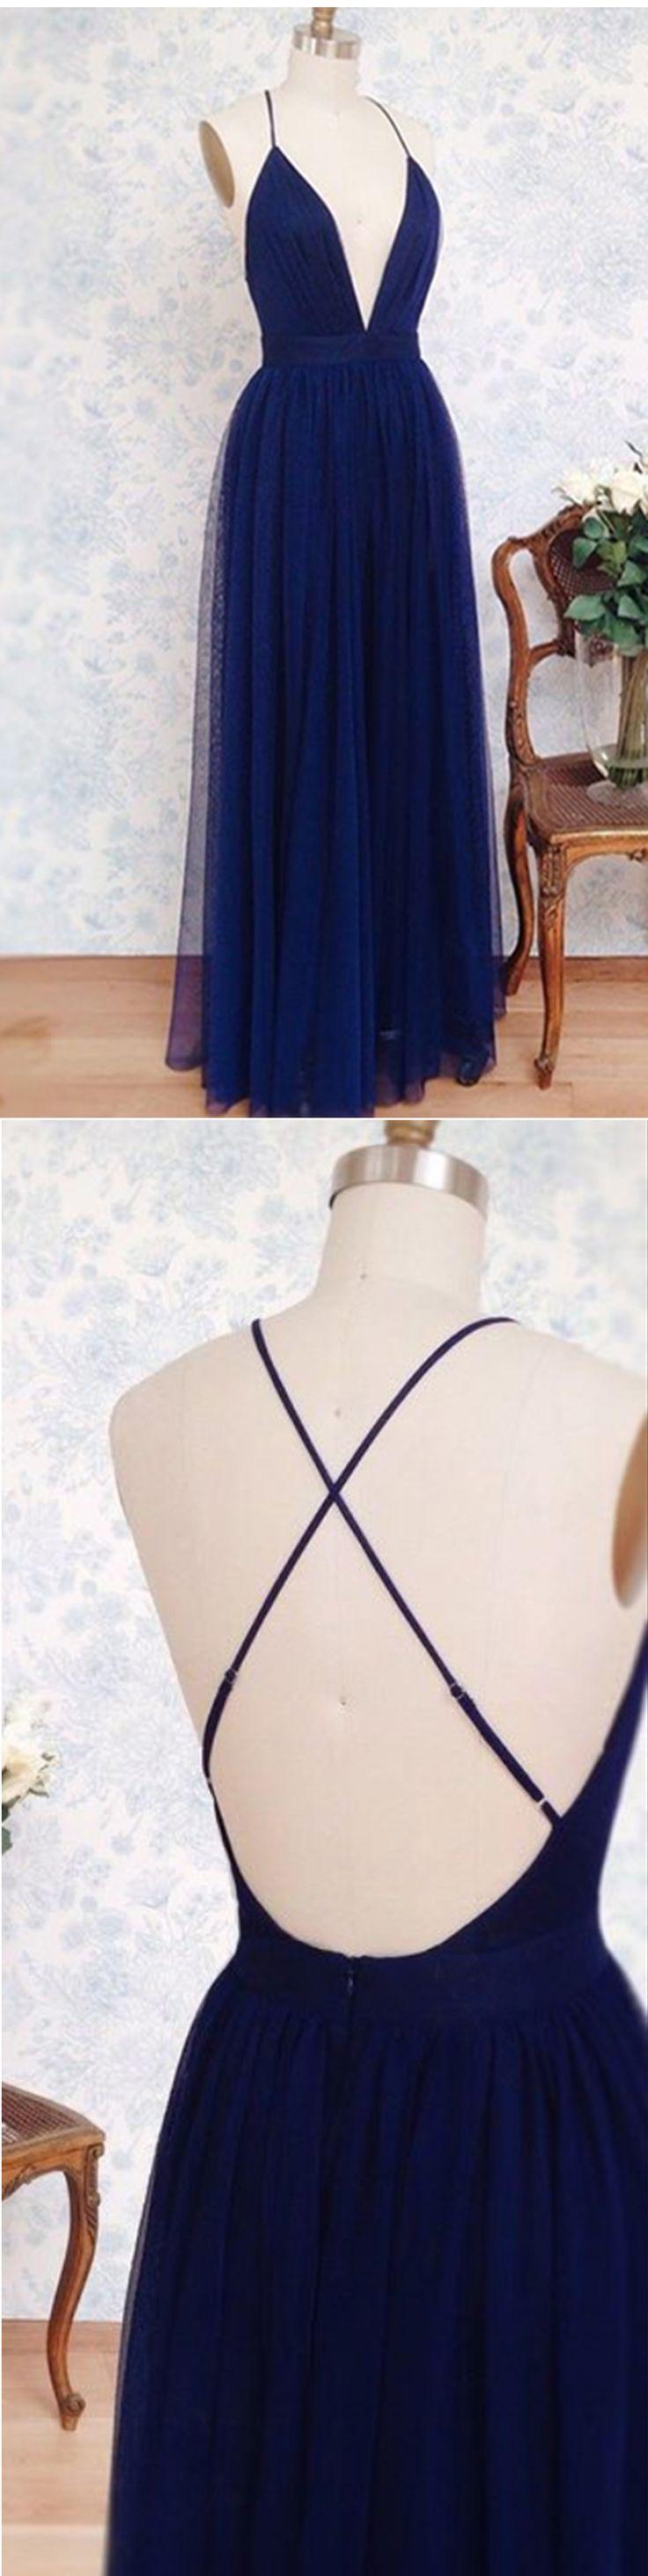 Simple navy blue tulle deep V neck backless long evening dresses